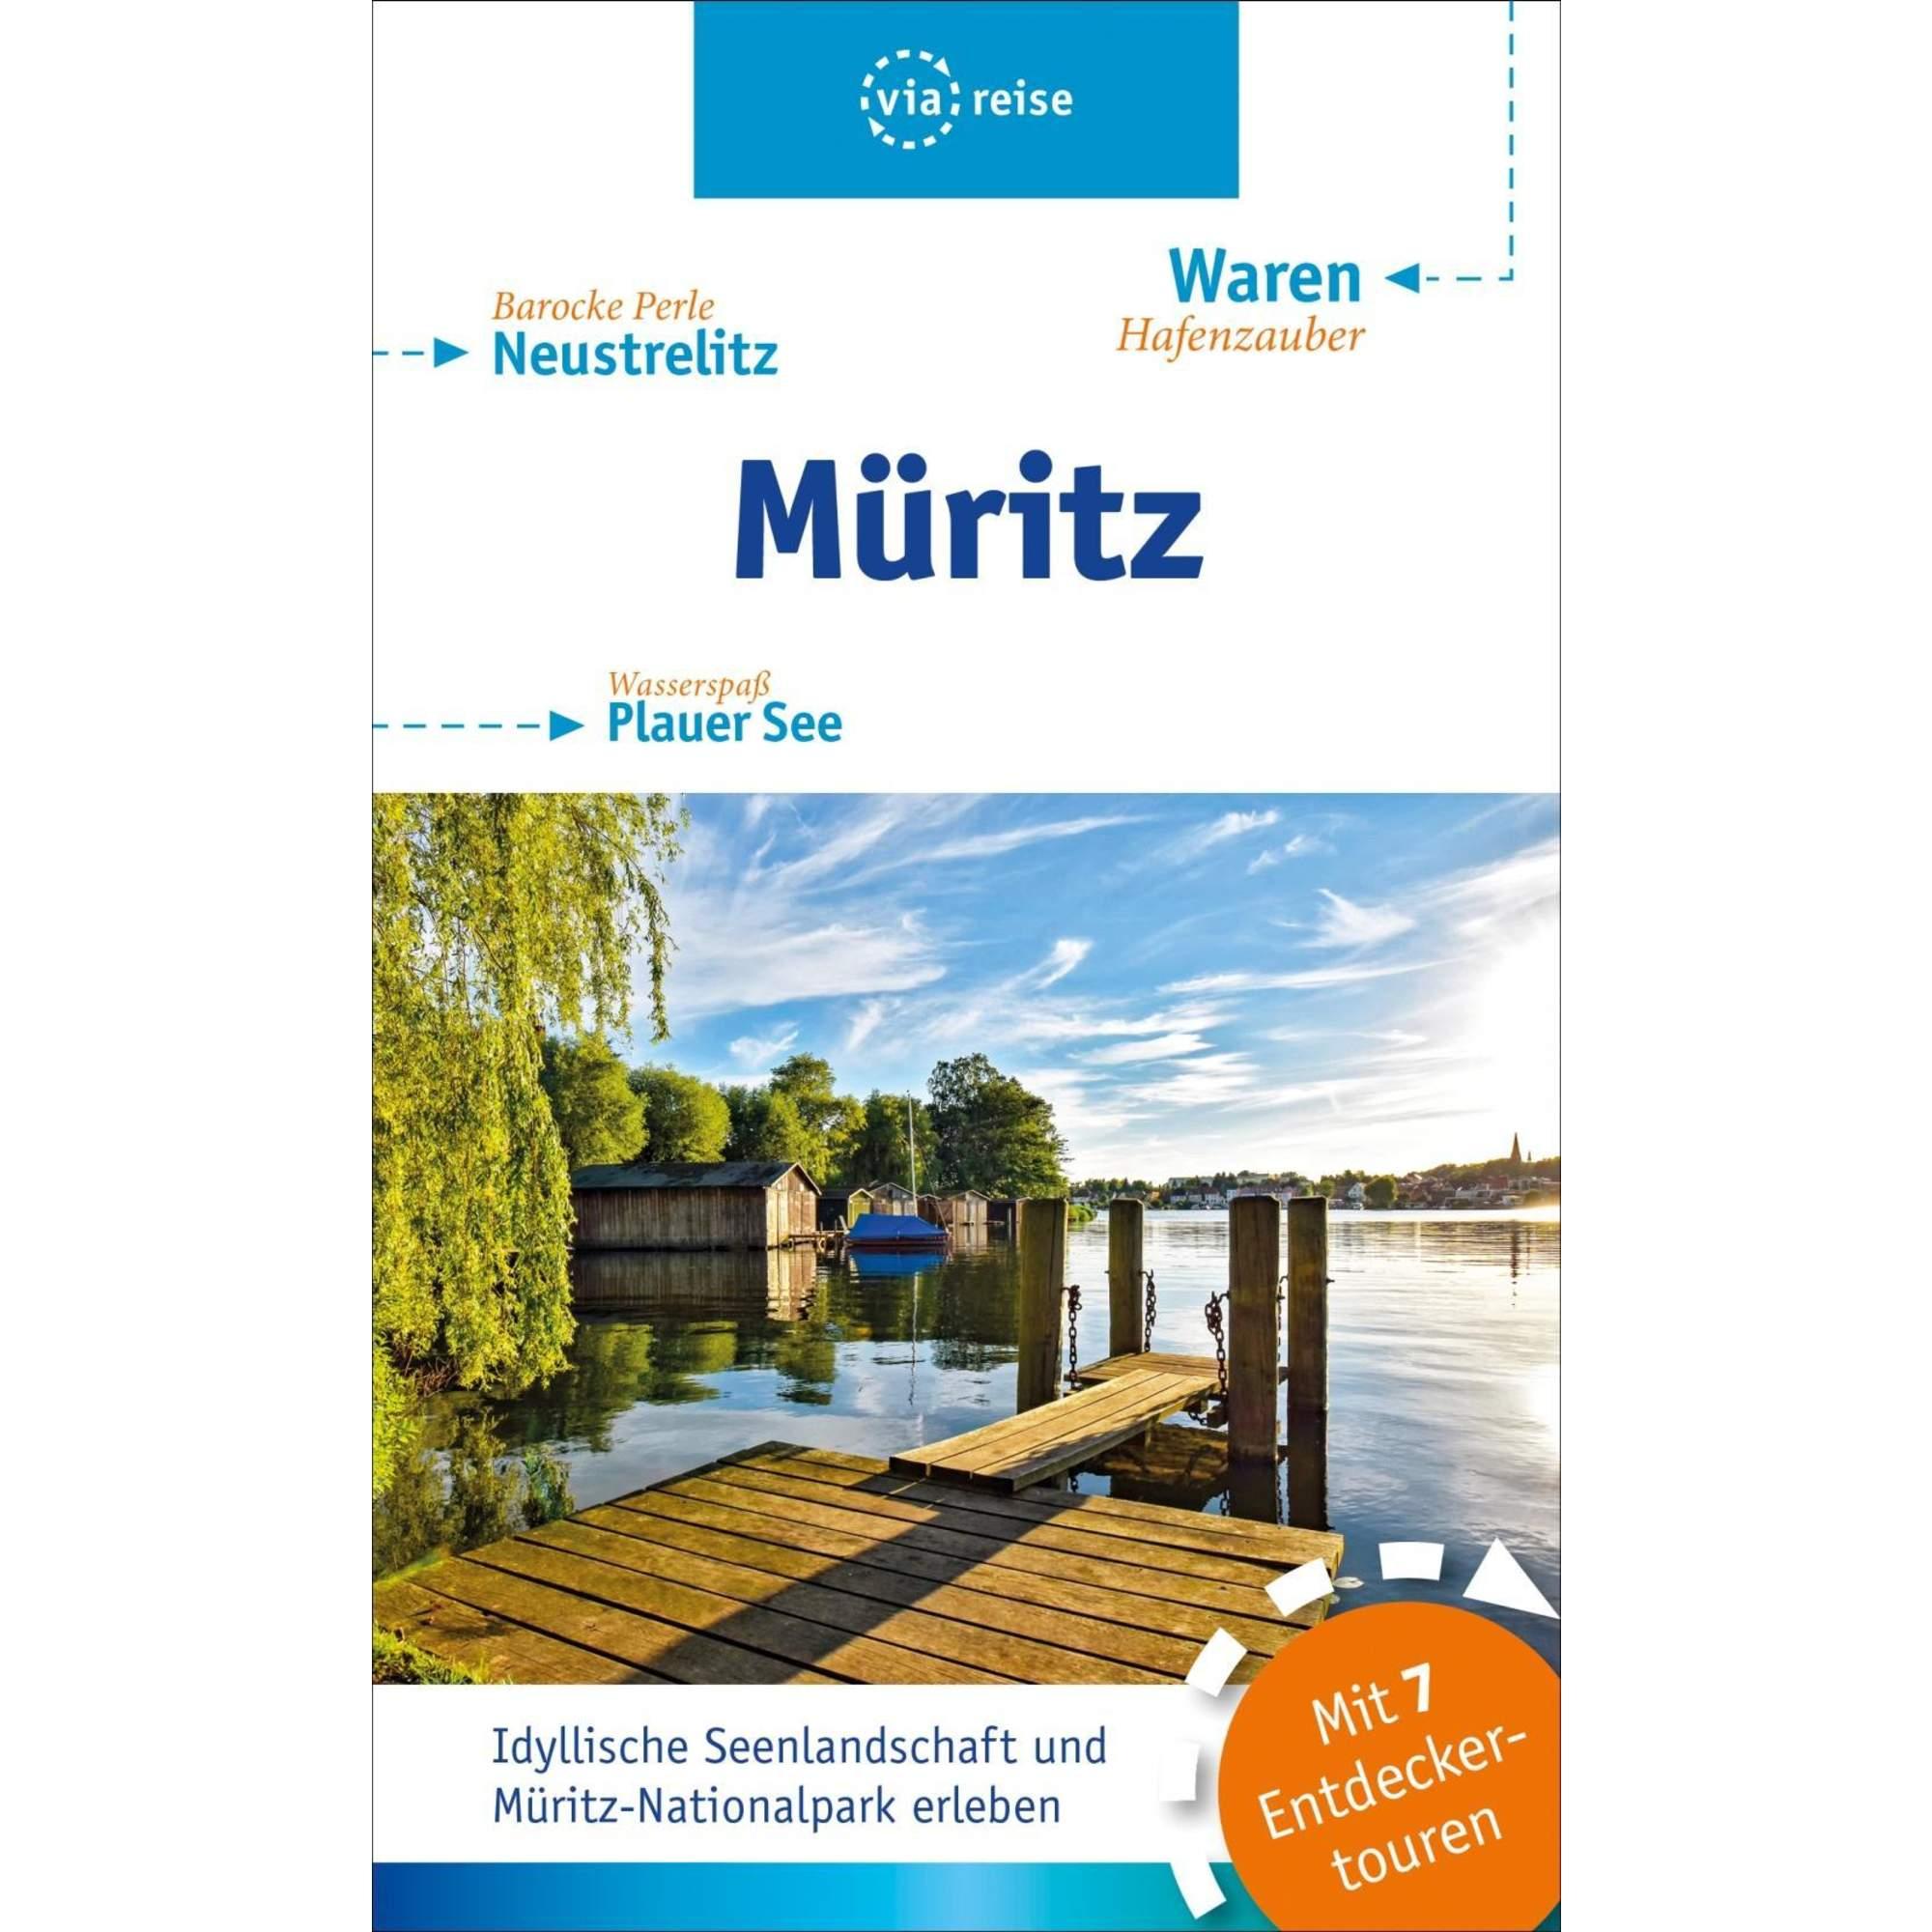 Müritz, 11,95 Euro